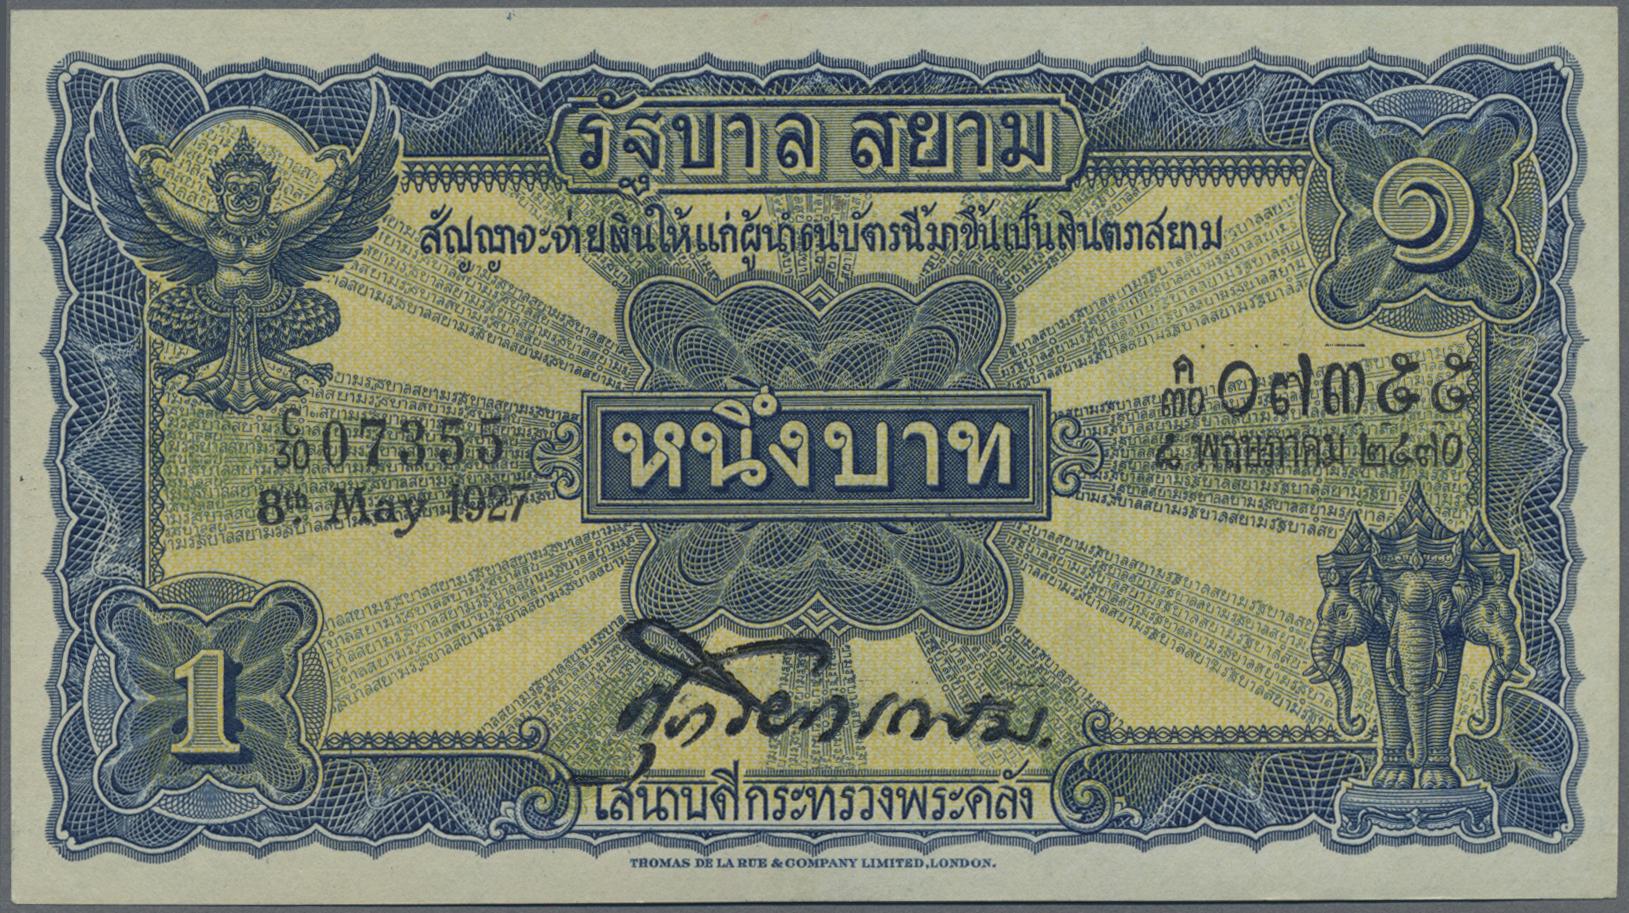 Lot 9510 - thailand banknoten -  Auktionshaus Christoph Gärtner GmbH & Co. KG Sale #47 Banknotes Worldwide & Germany, Numismatics